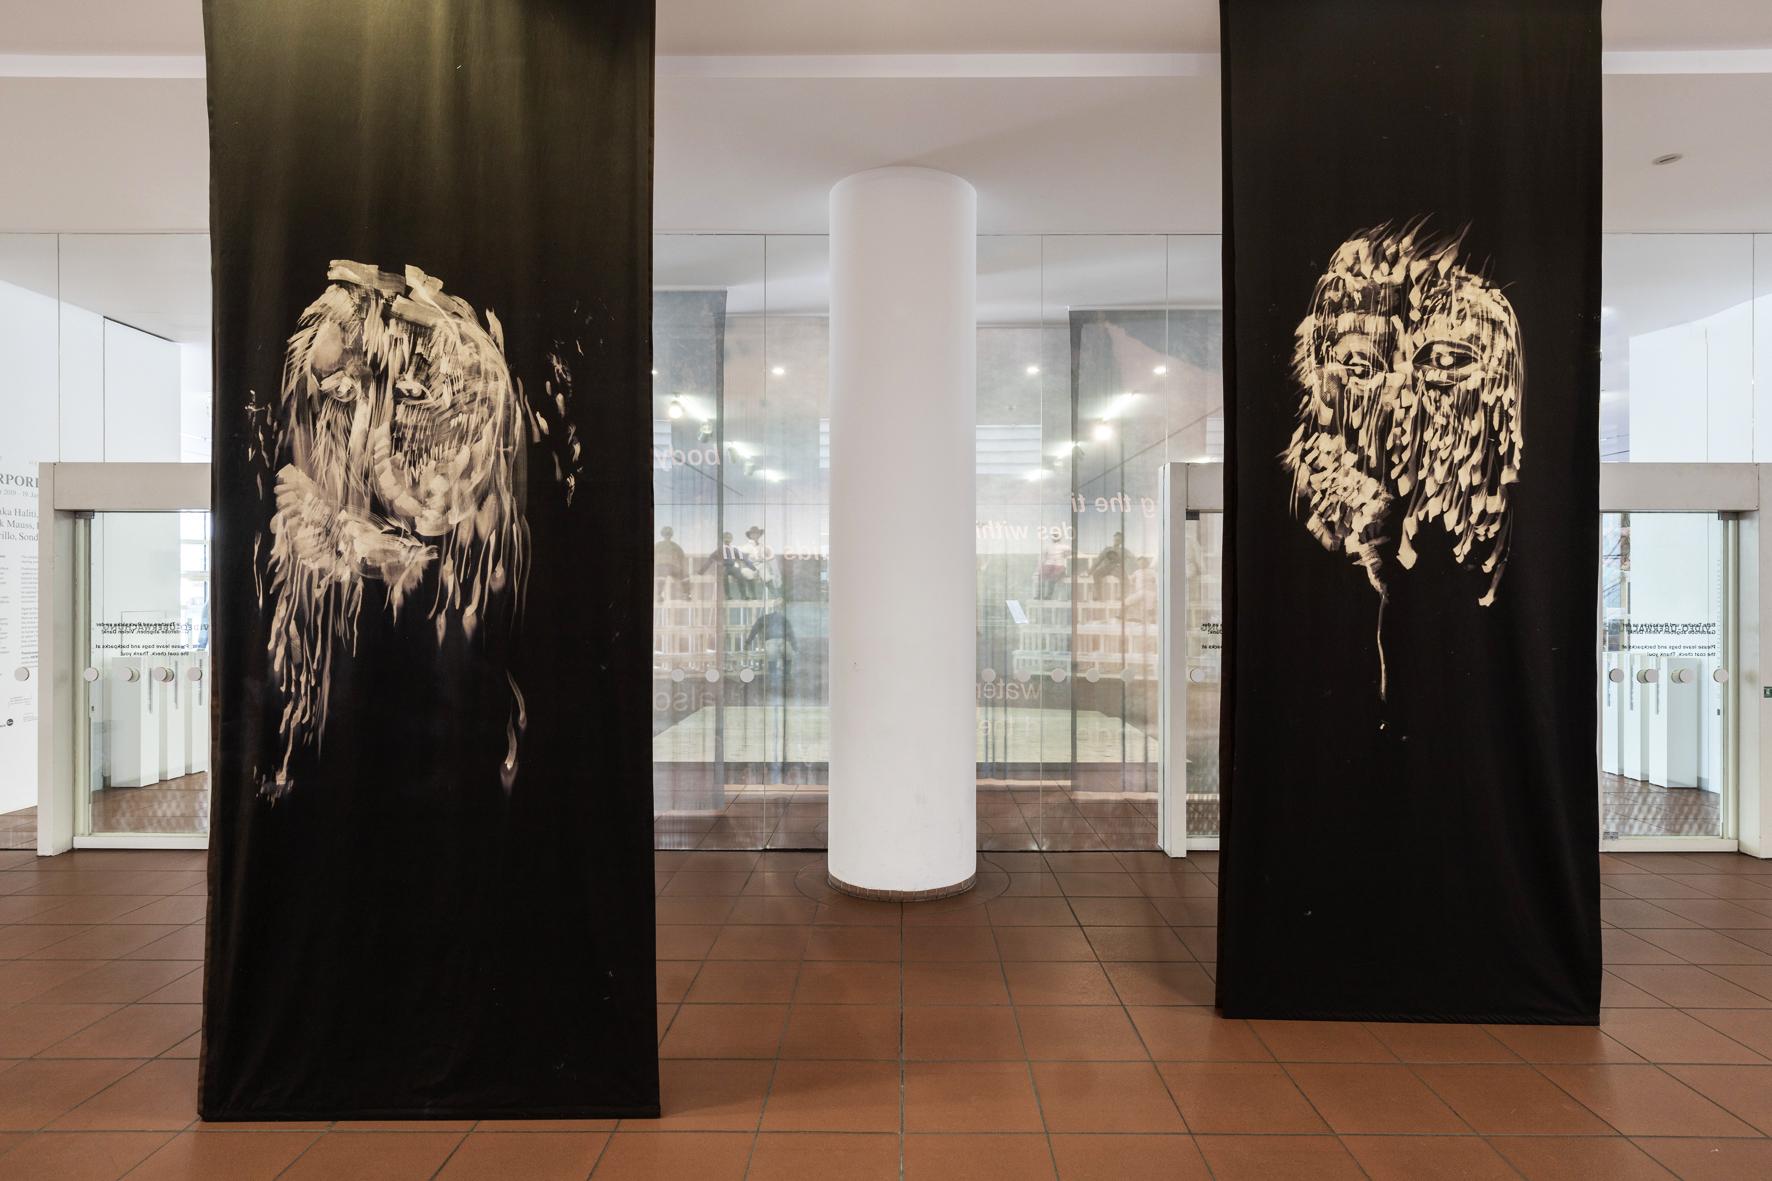 Köln, Museum Ludwig, ML, Ausstellung ''Hier und Jetzt - Transcorporealities'', 21. September 2019 - 19. Januar 2020, Maheke, Paul, ooloi (O/Oi), Installationsansicht